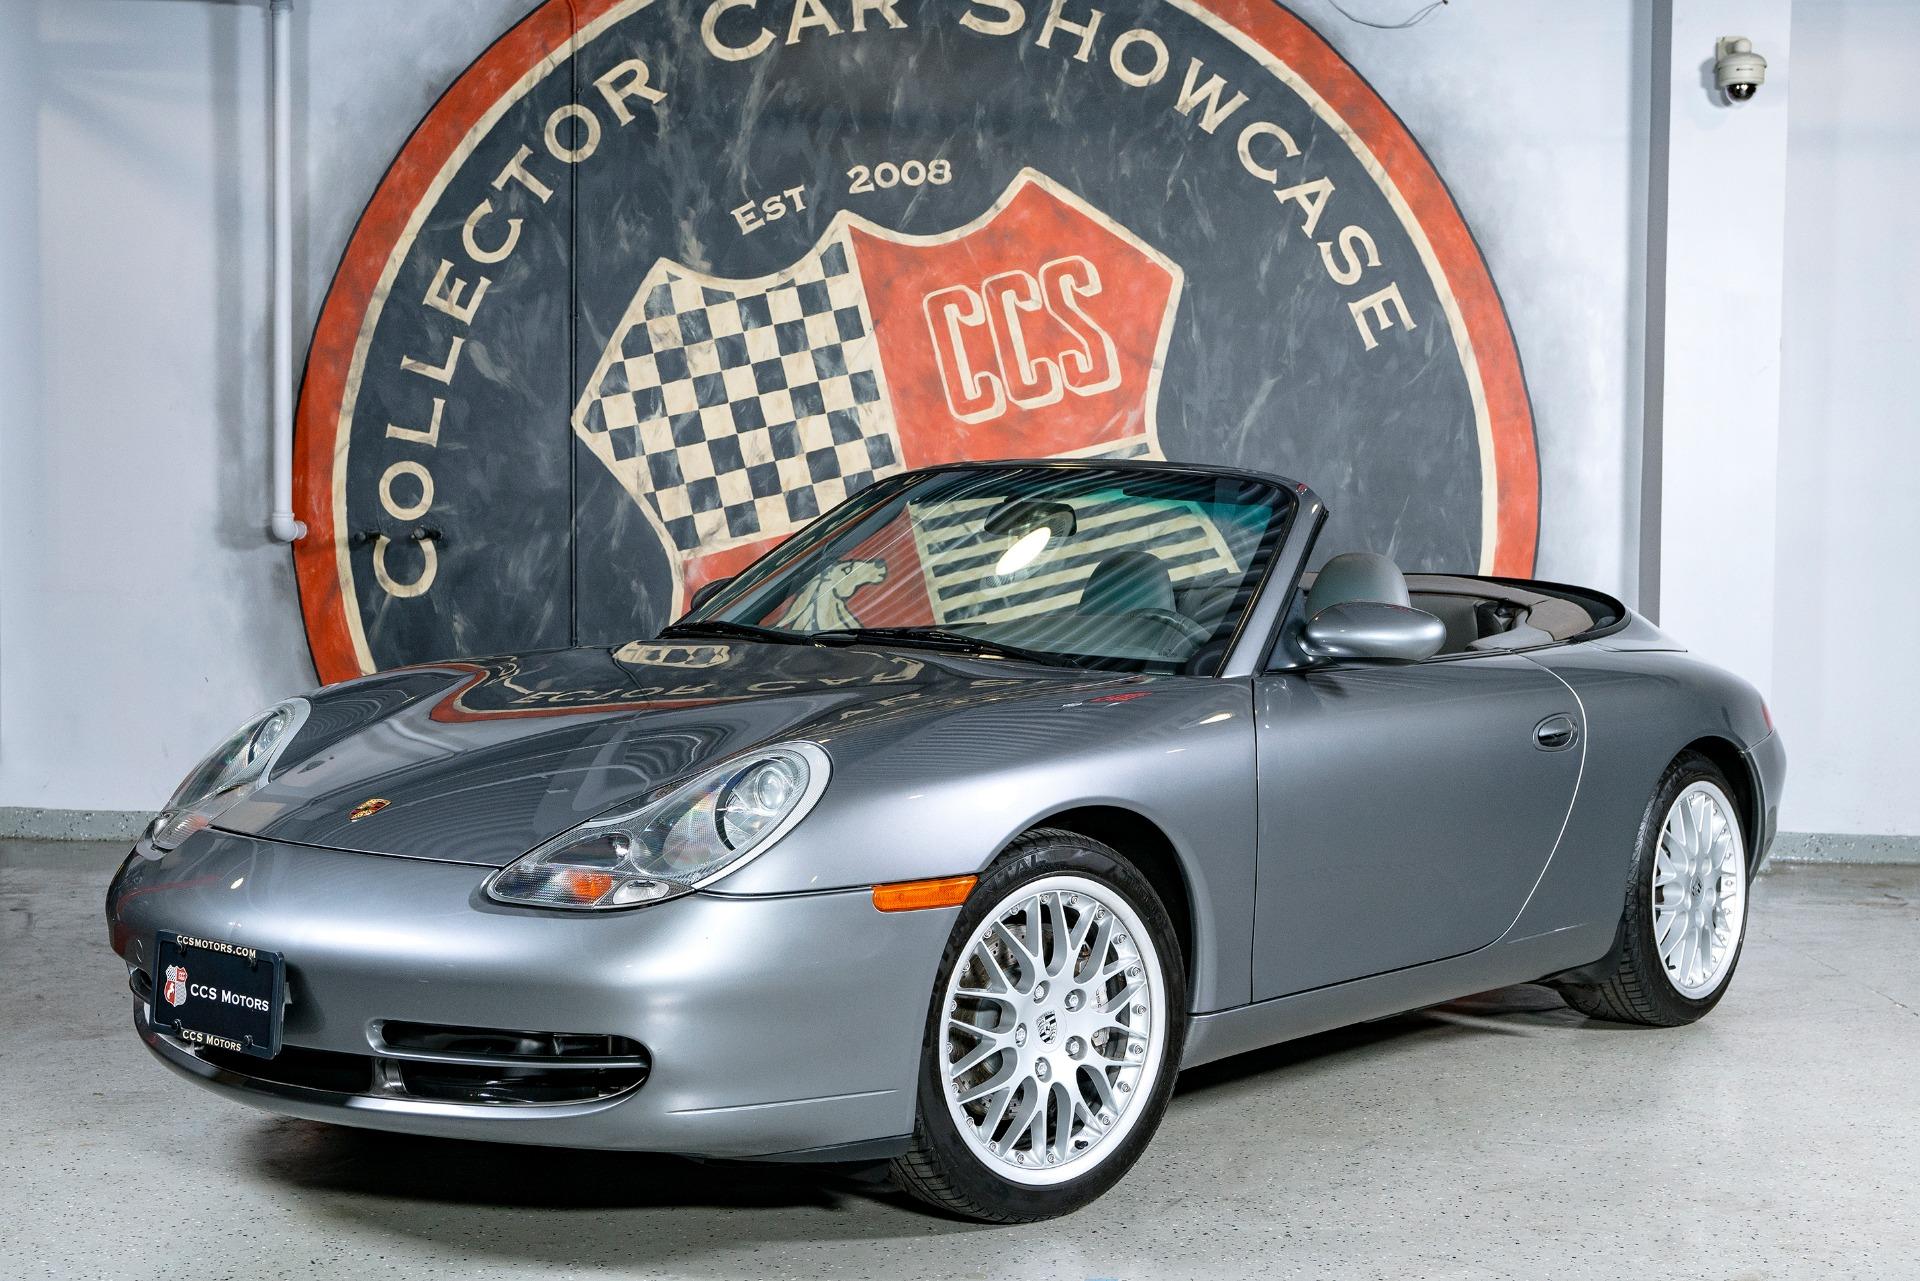 Used 2001 PORSCHE 911 Carrera 4 Cabriolet | Oyster Bay, NY